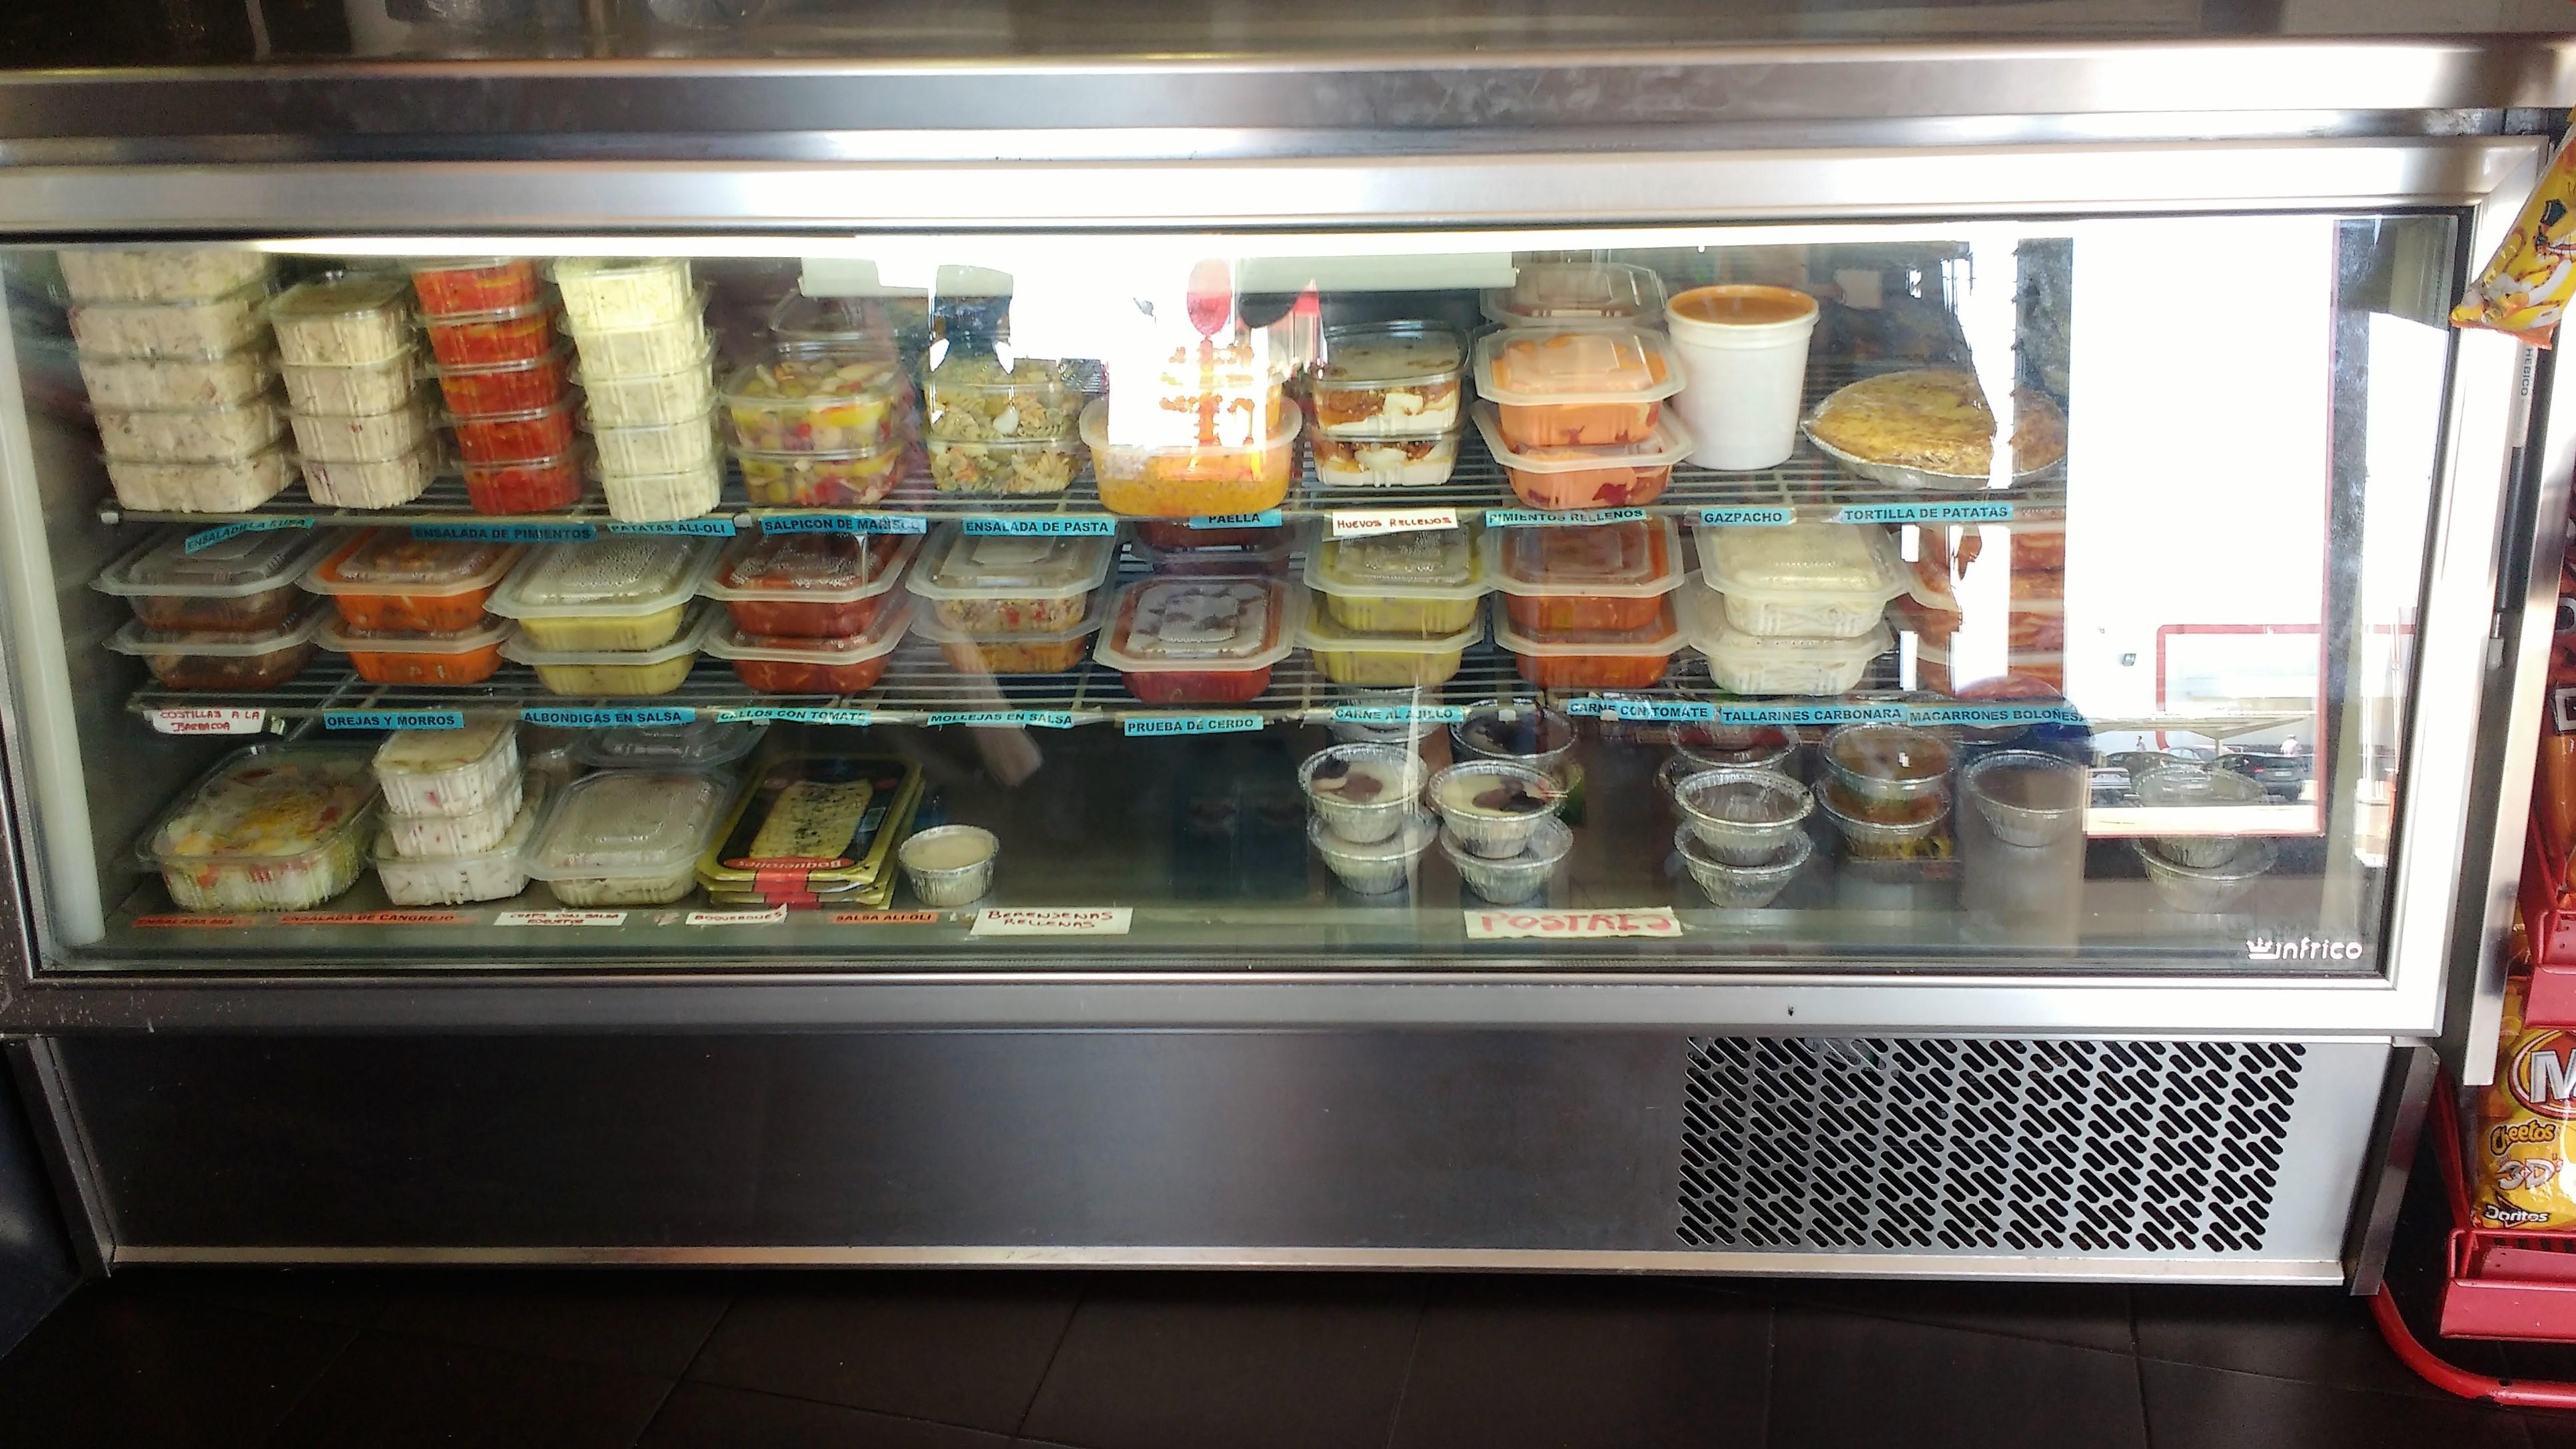 pollos asados comida para llevar Cáceres Pichon